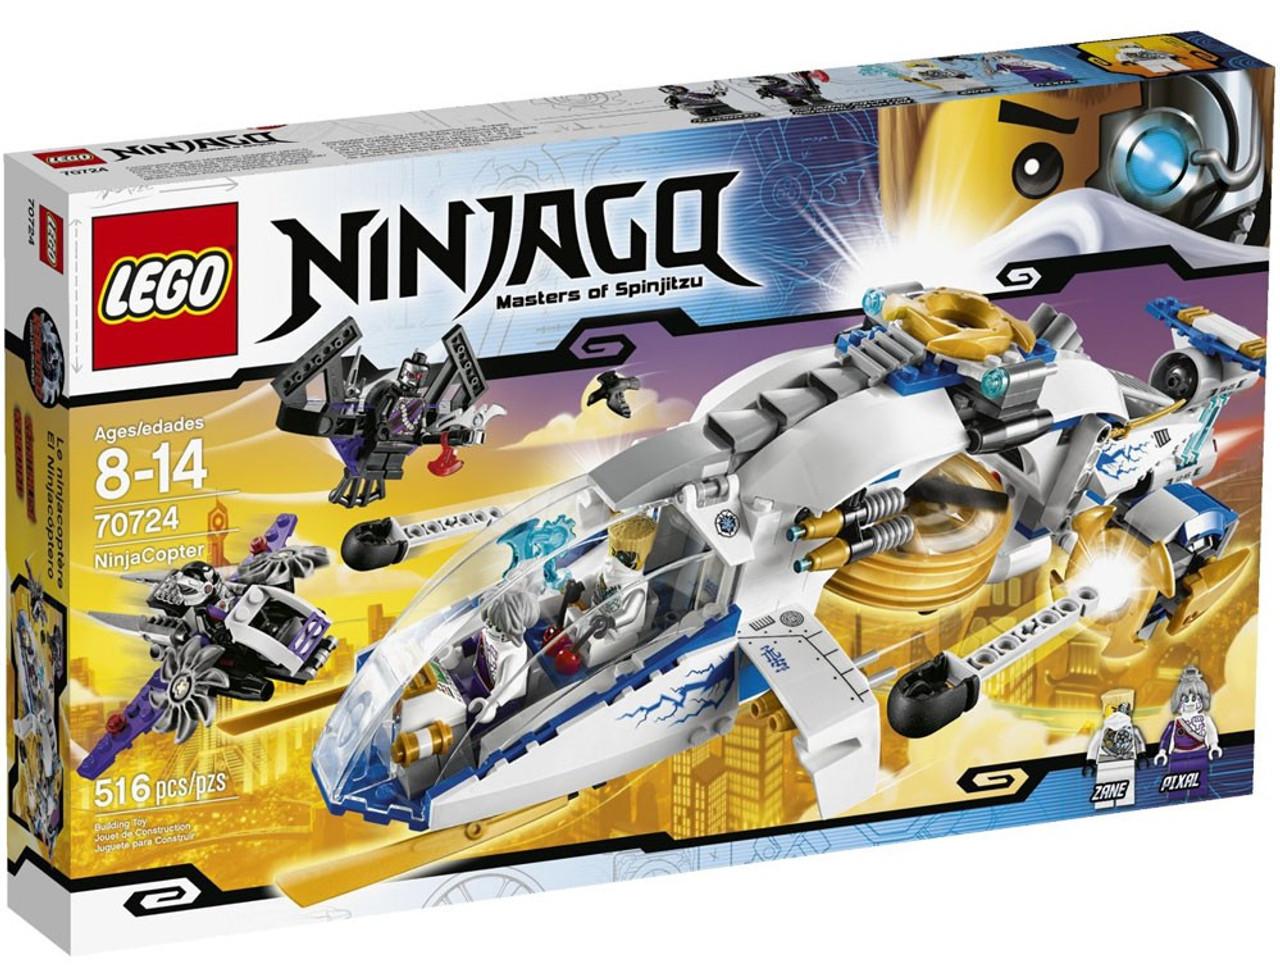 LEGO Ninjago Rebooted Ninja Copter Set #70724